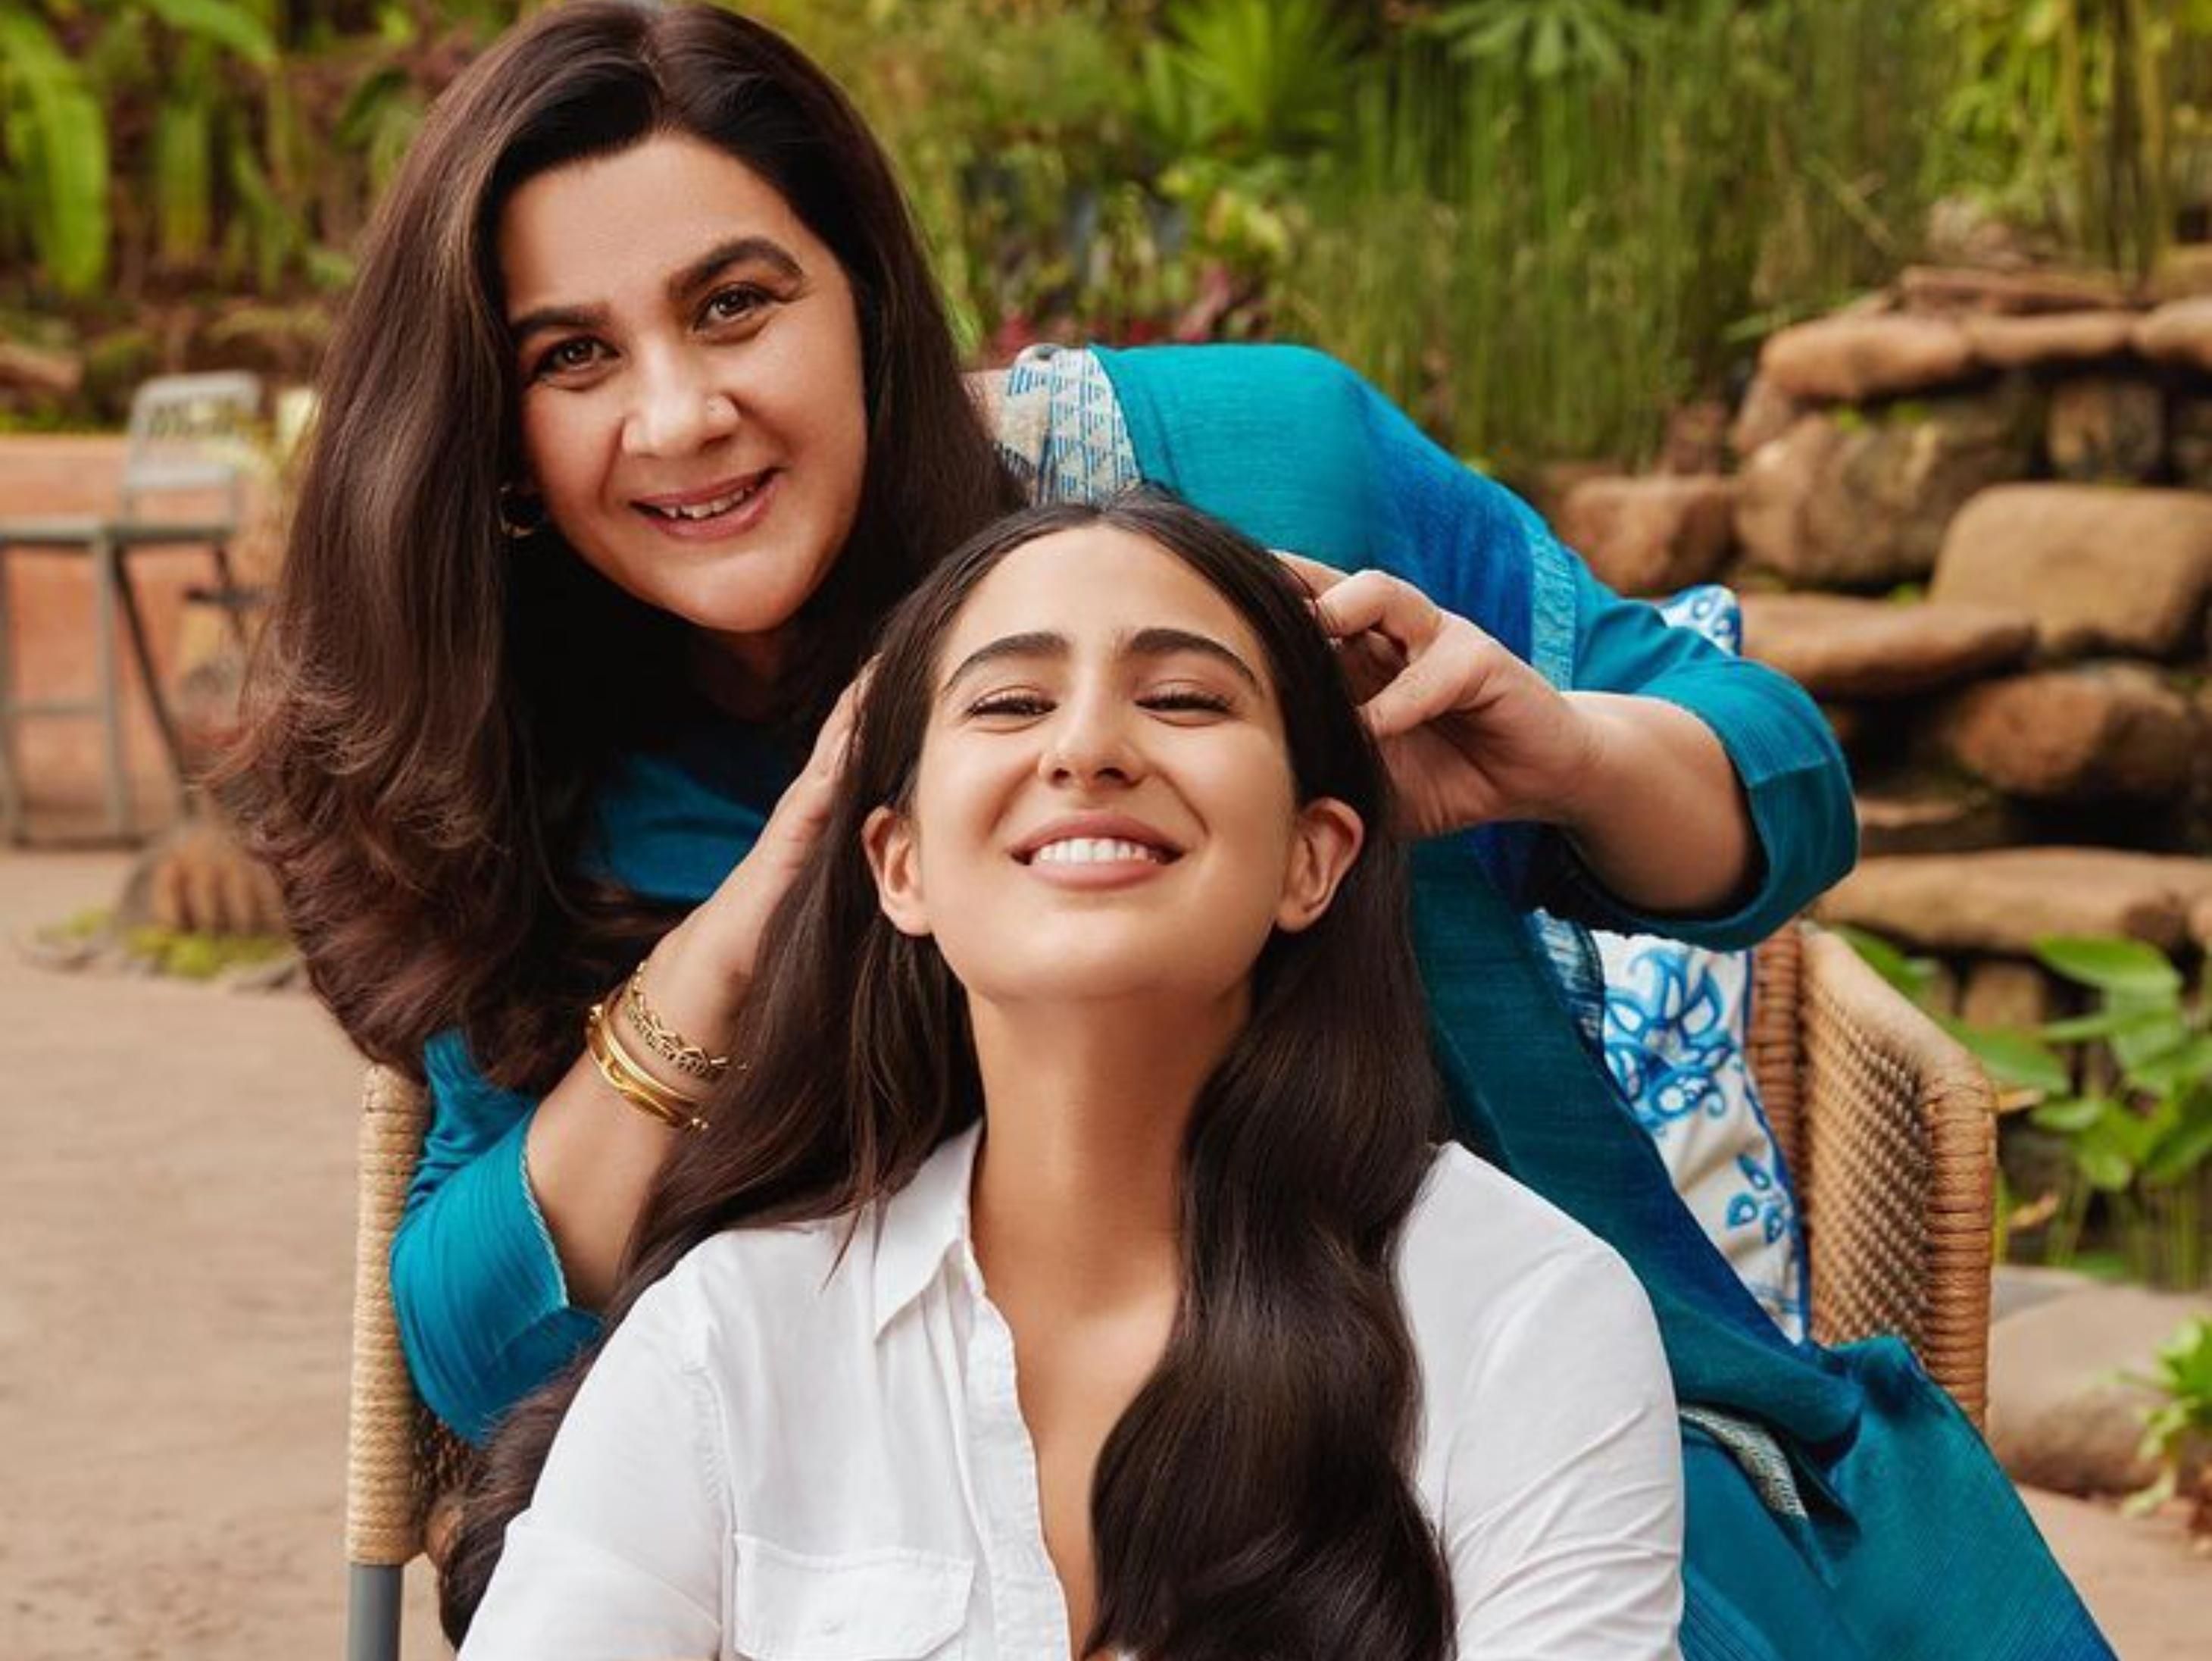 Sara Ali Khan First Time share screen space with mom Amrita Singh For an ad film | सारा के साथ नजर आएंगी अमृता सिंह; 30 साल बाद विज्ञापन किया, एक्ट्रेस ने चम्पी करवाती फोटो की शेयर